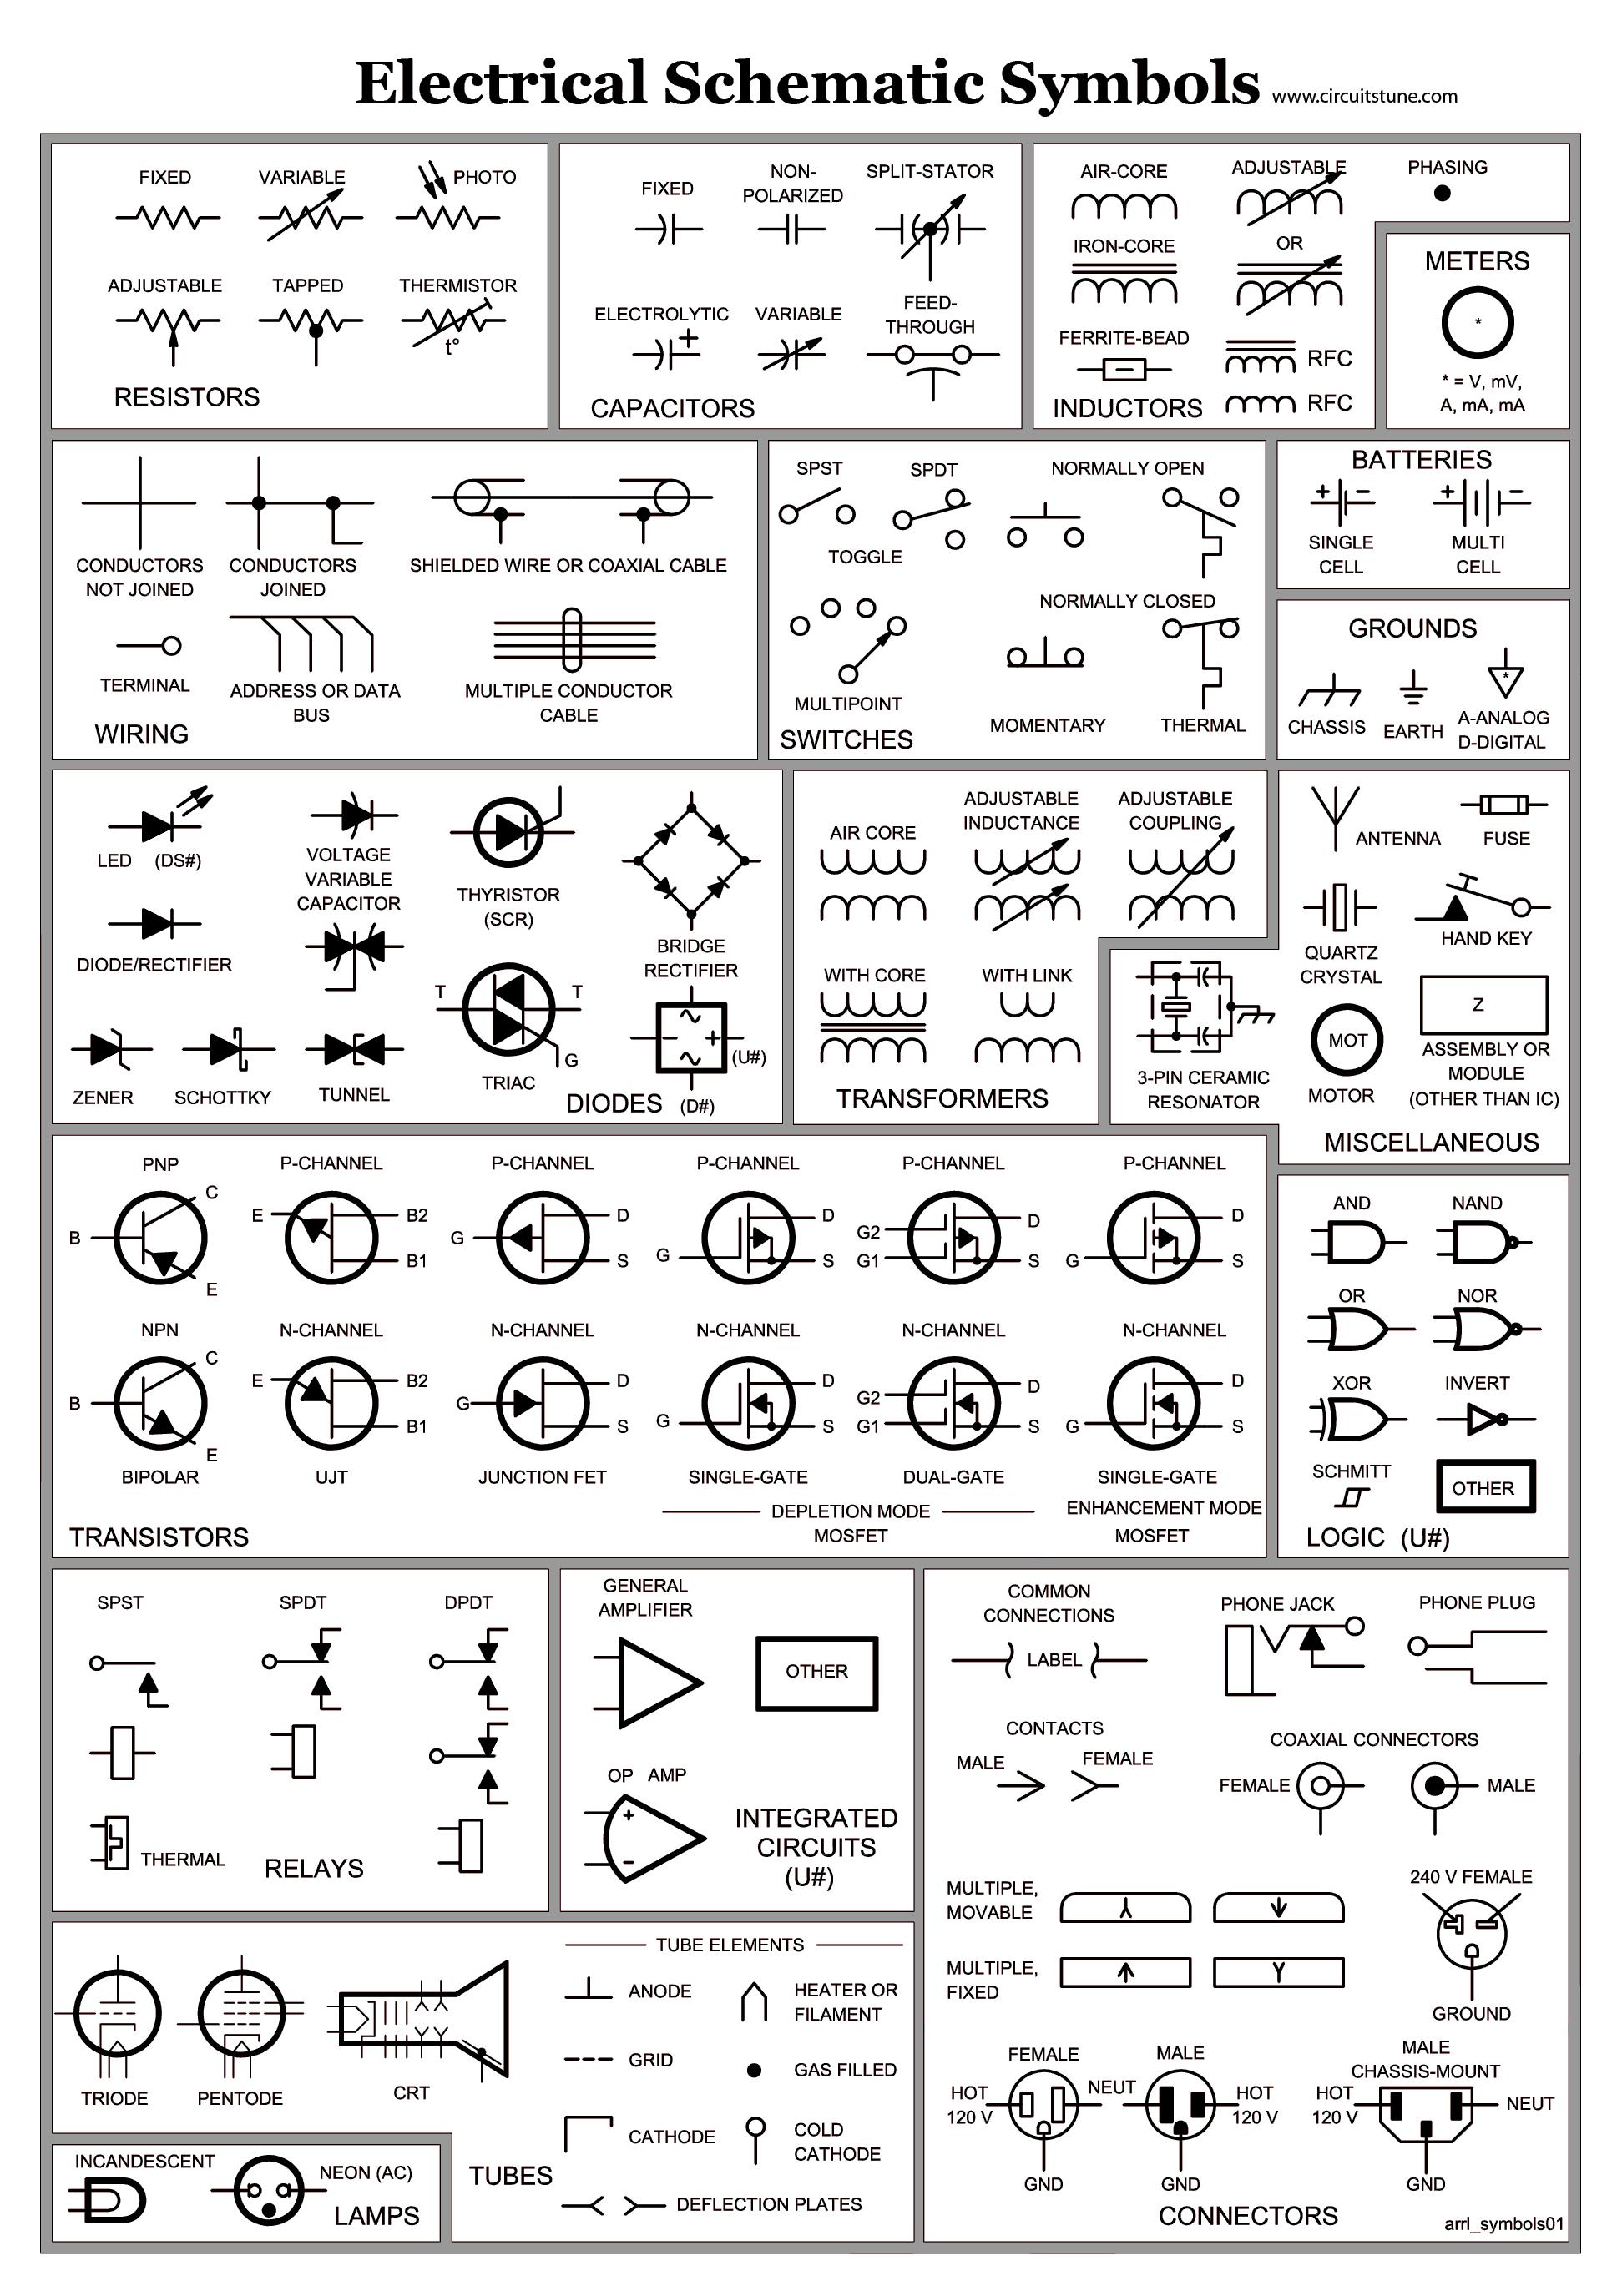 12 volt wiring diagram symbol legend wiring diagrams Electrical Symbol Legend